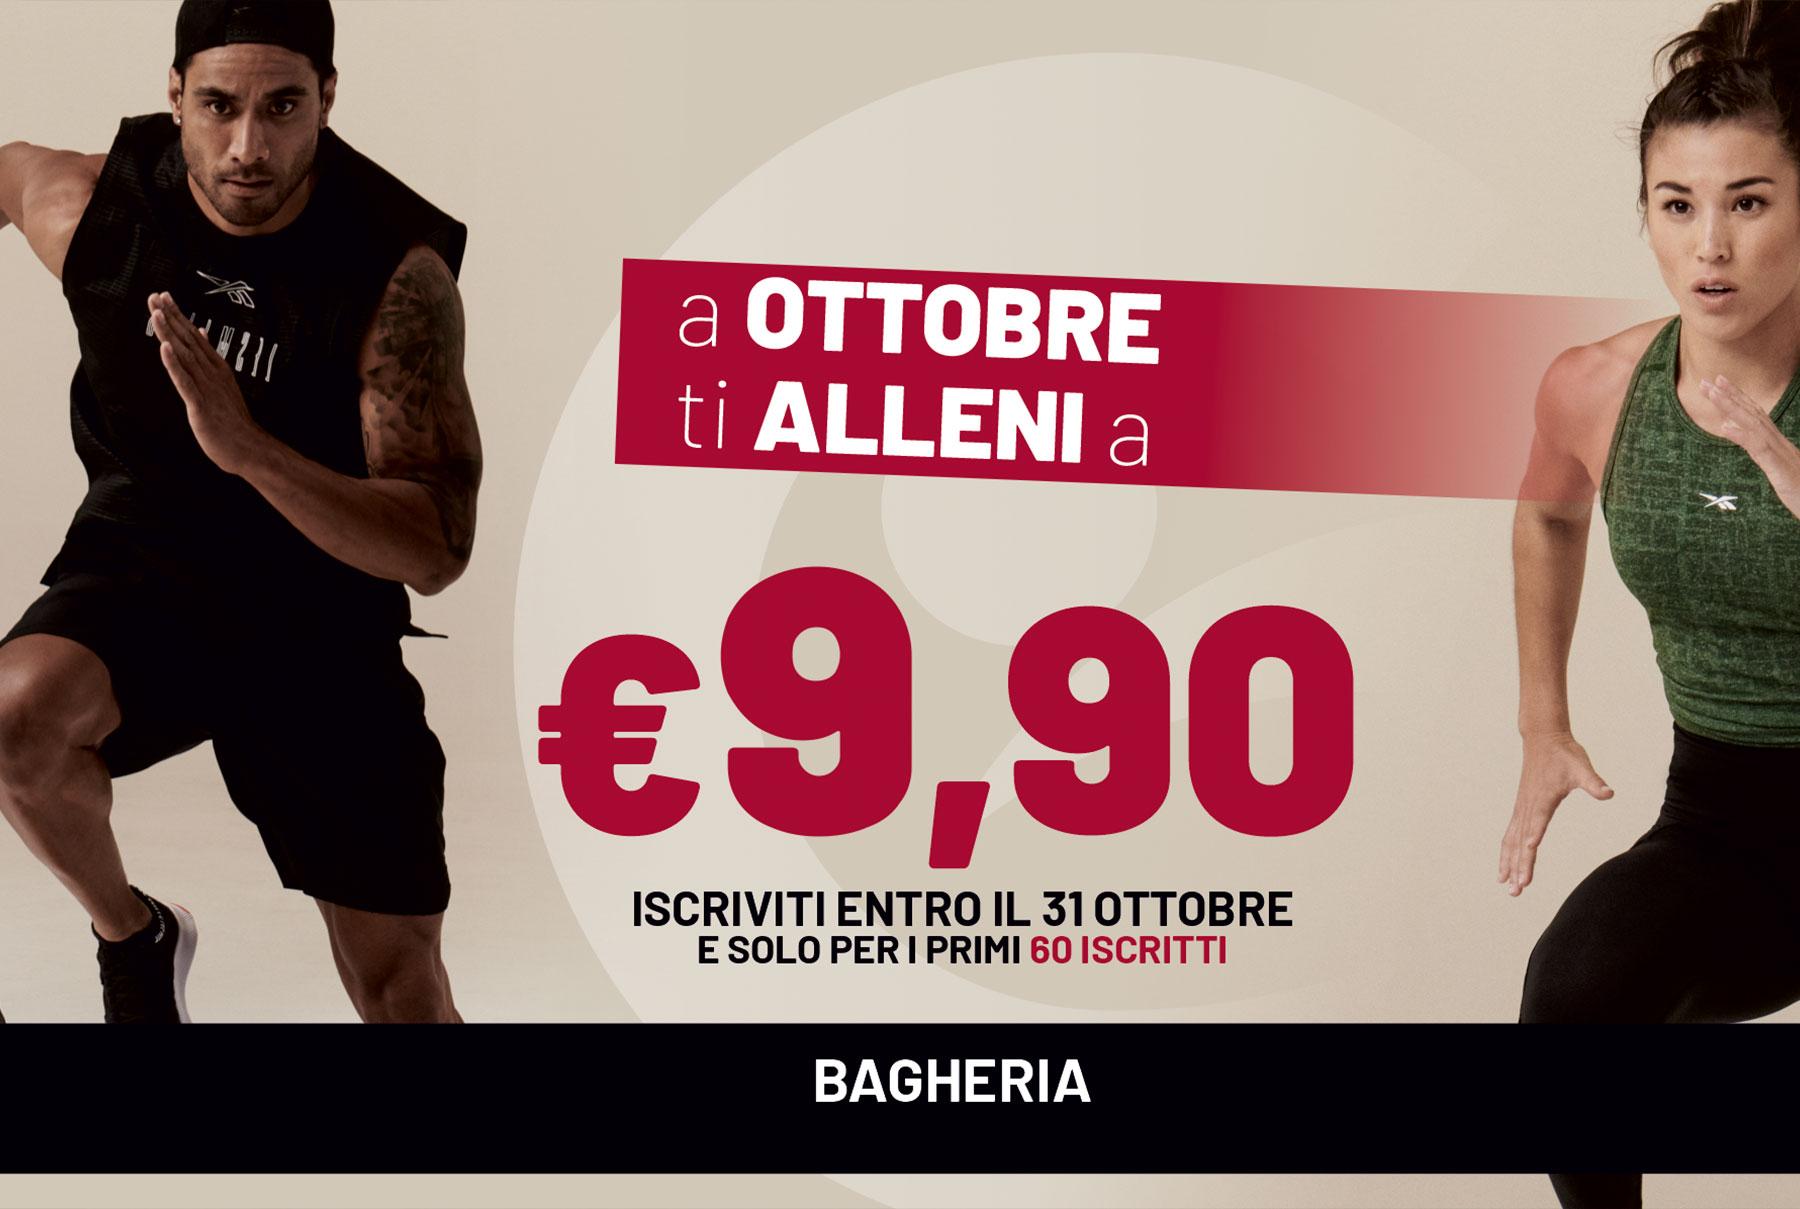 Promo-ottobre-2020-Bagheria